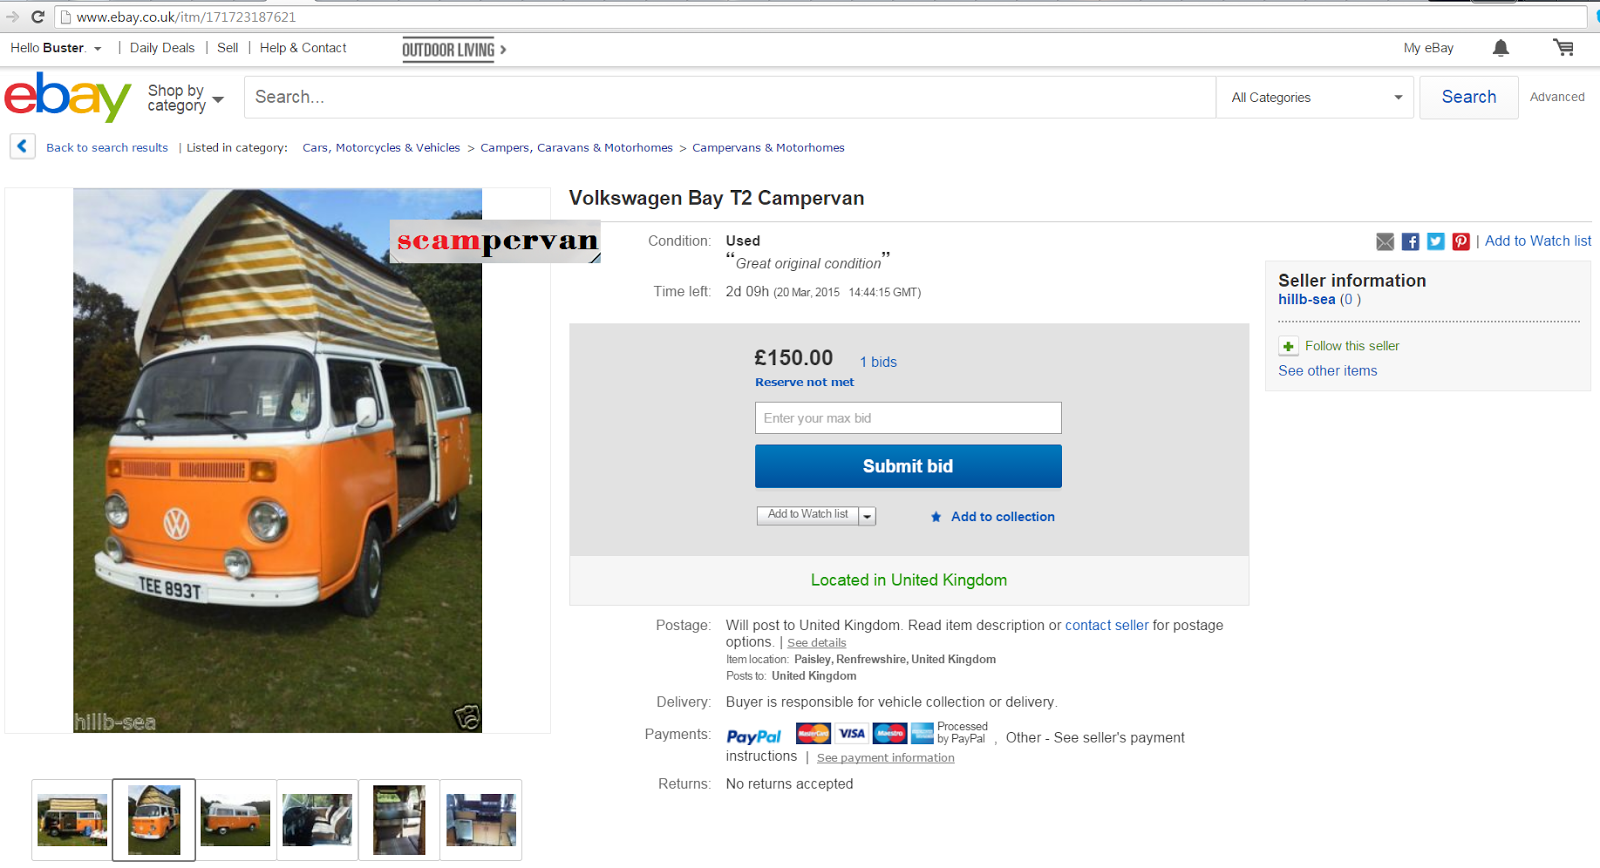 Ebay Scam Volkswagen Bay T2 Campervan Devon Moonraker Tee893t Fraud Tee 893t 18 Legalbeagles Forum